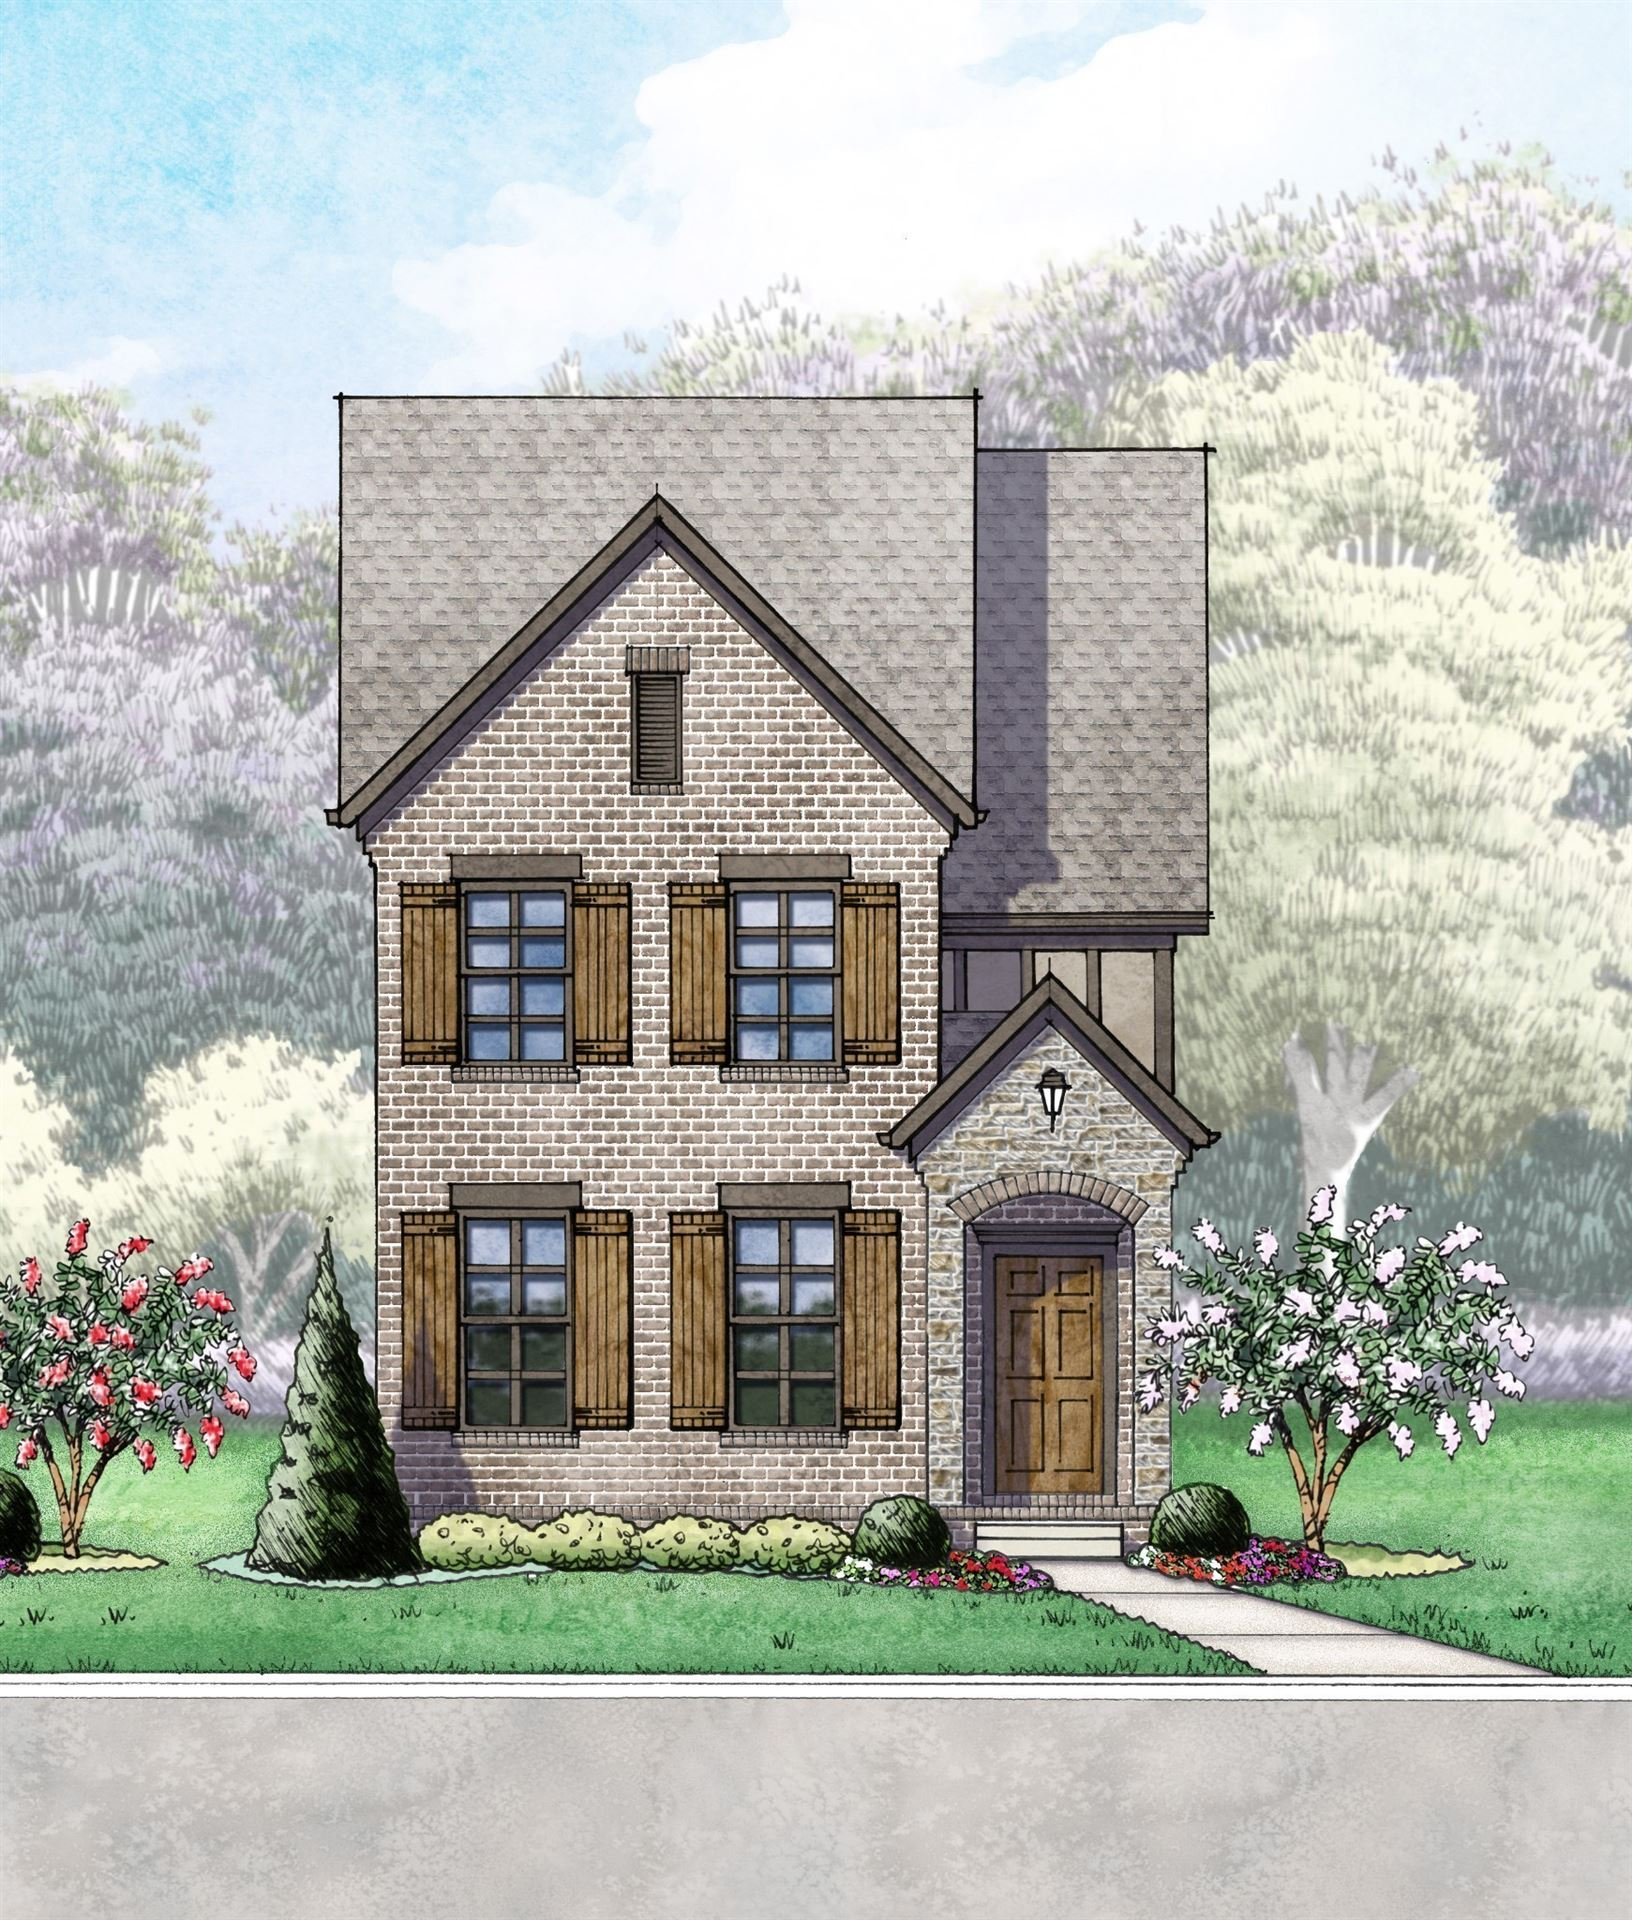 Photo of 141 Bellagio Villas DR #12, Spring Hill, TN 37174 (MLS # 2179231)